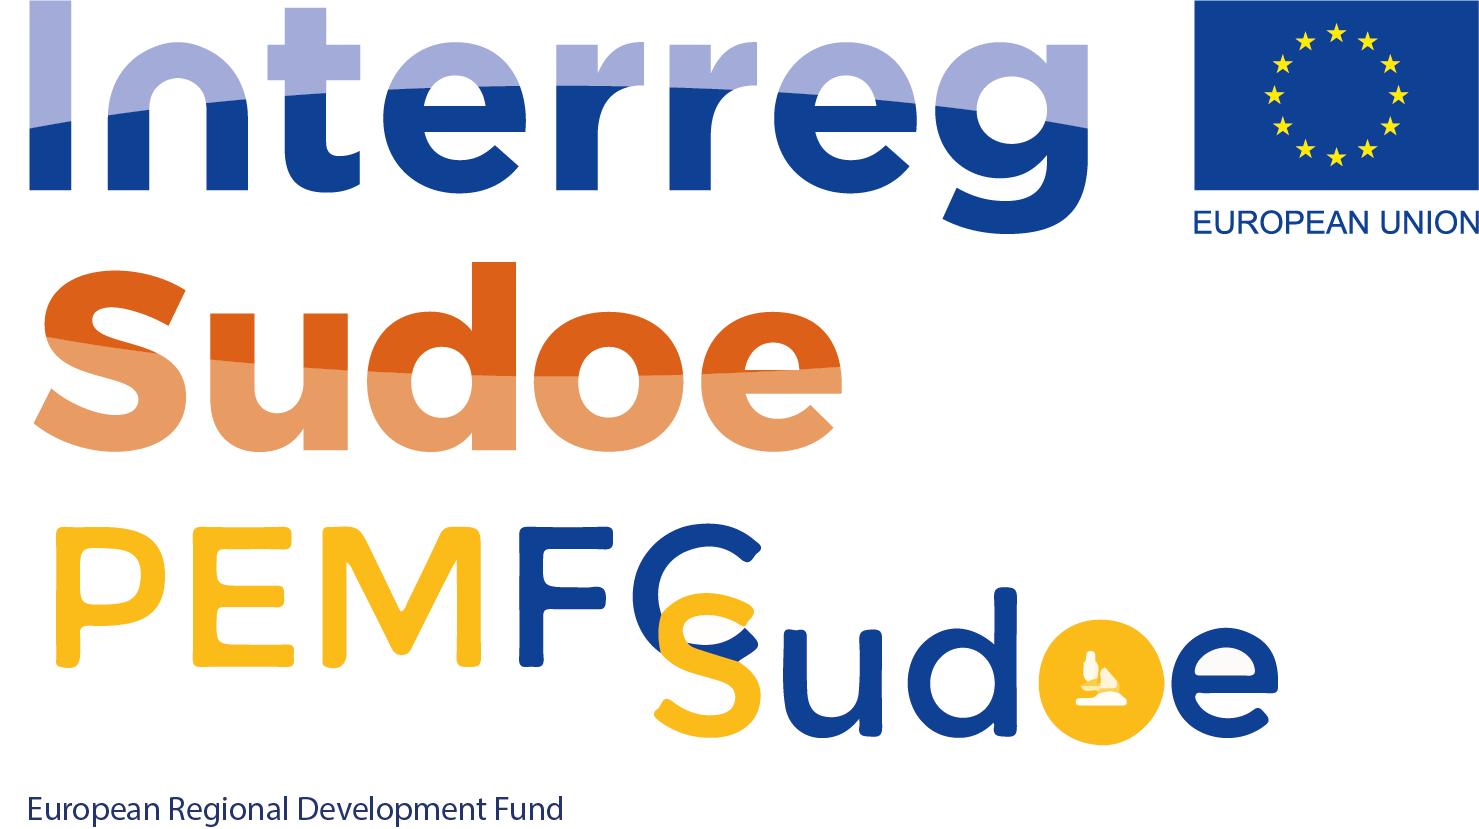 PEMFC_SUDOE